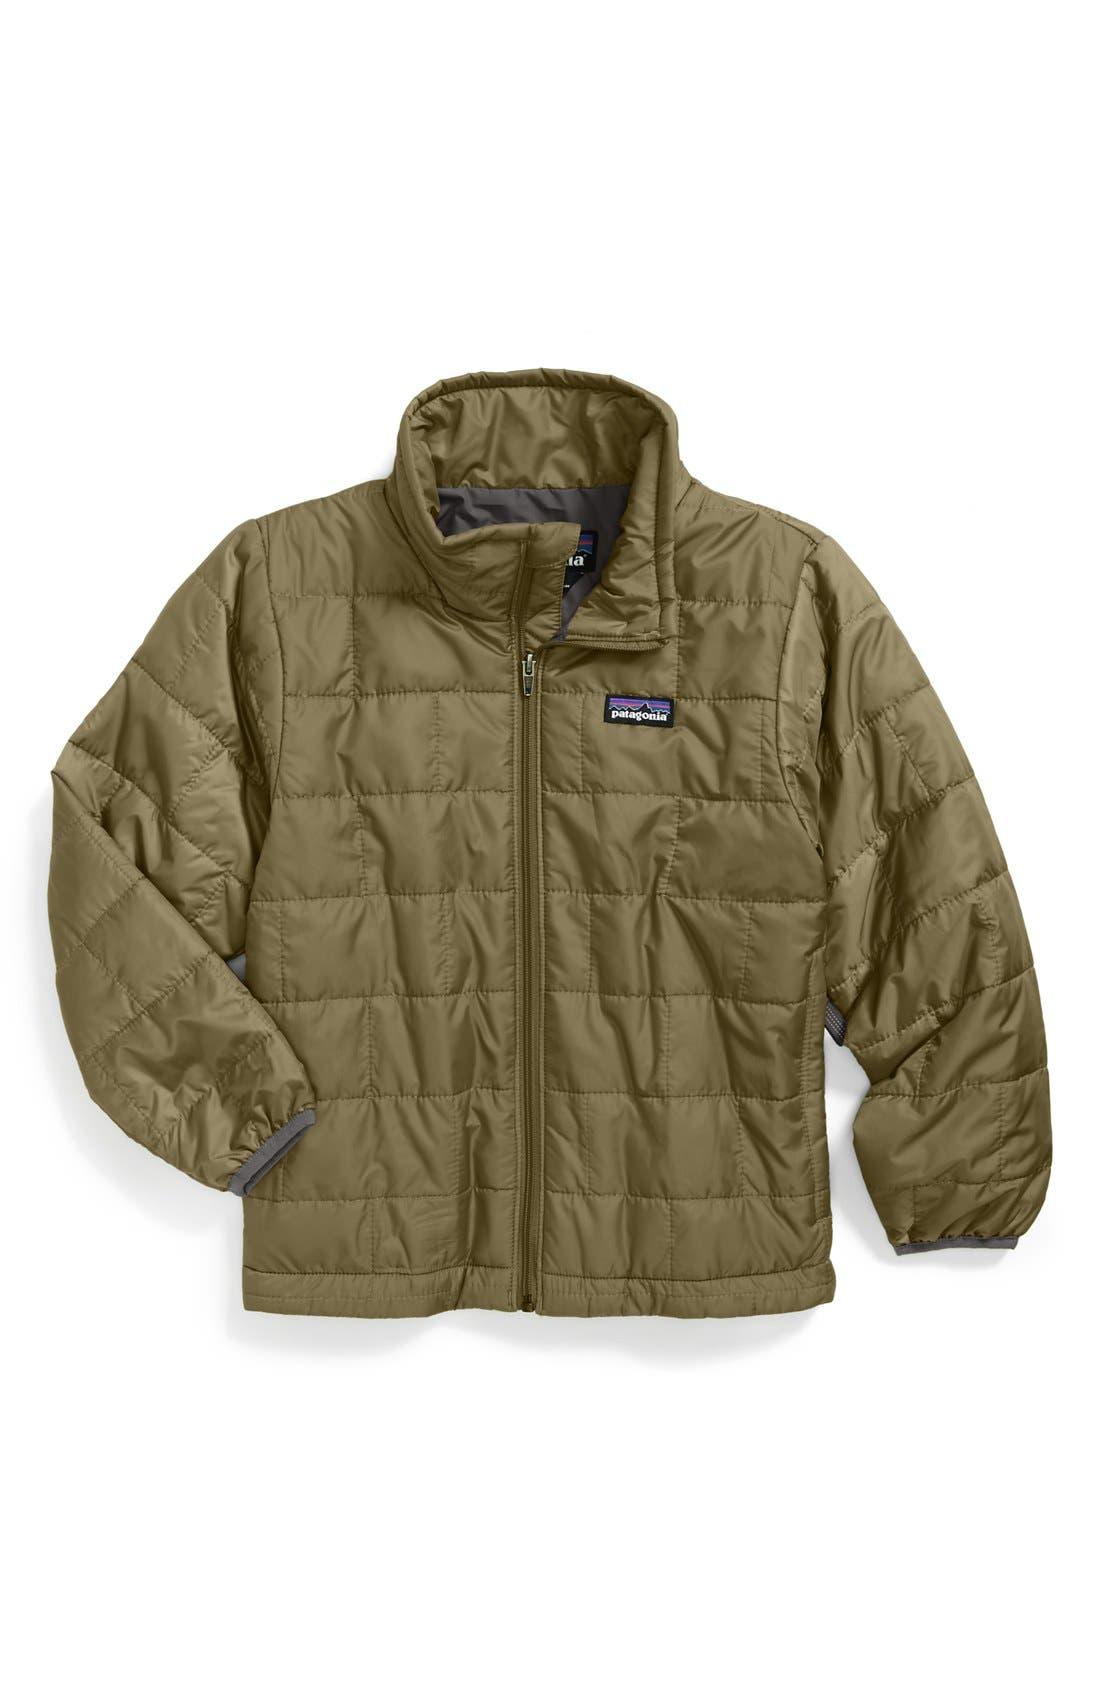 Alternate Image 1 Selected - Patagonia 'Nano Puff' Wind Resistant Water Resistant Jacket (Little Boys & Big Boys)